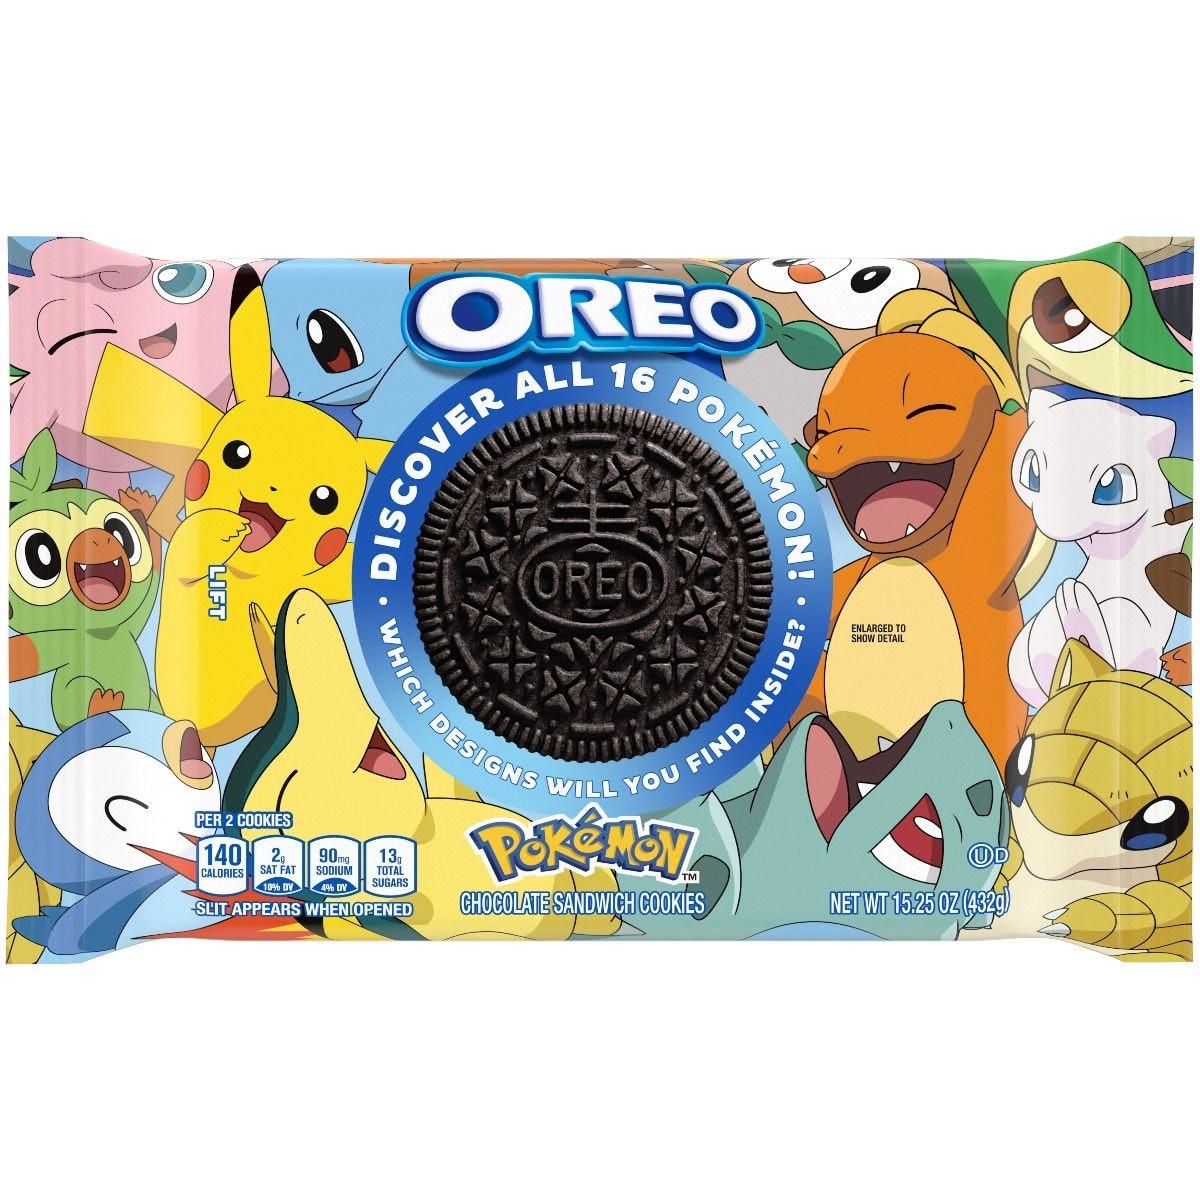 Limited Edition Pokémon x OREO Cookies